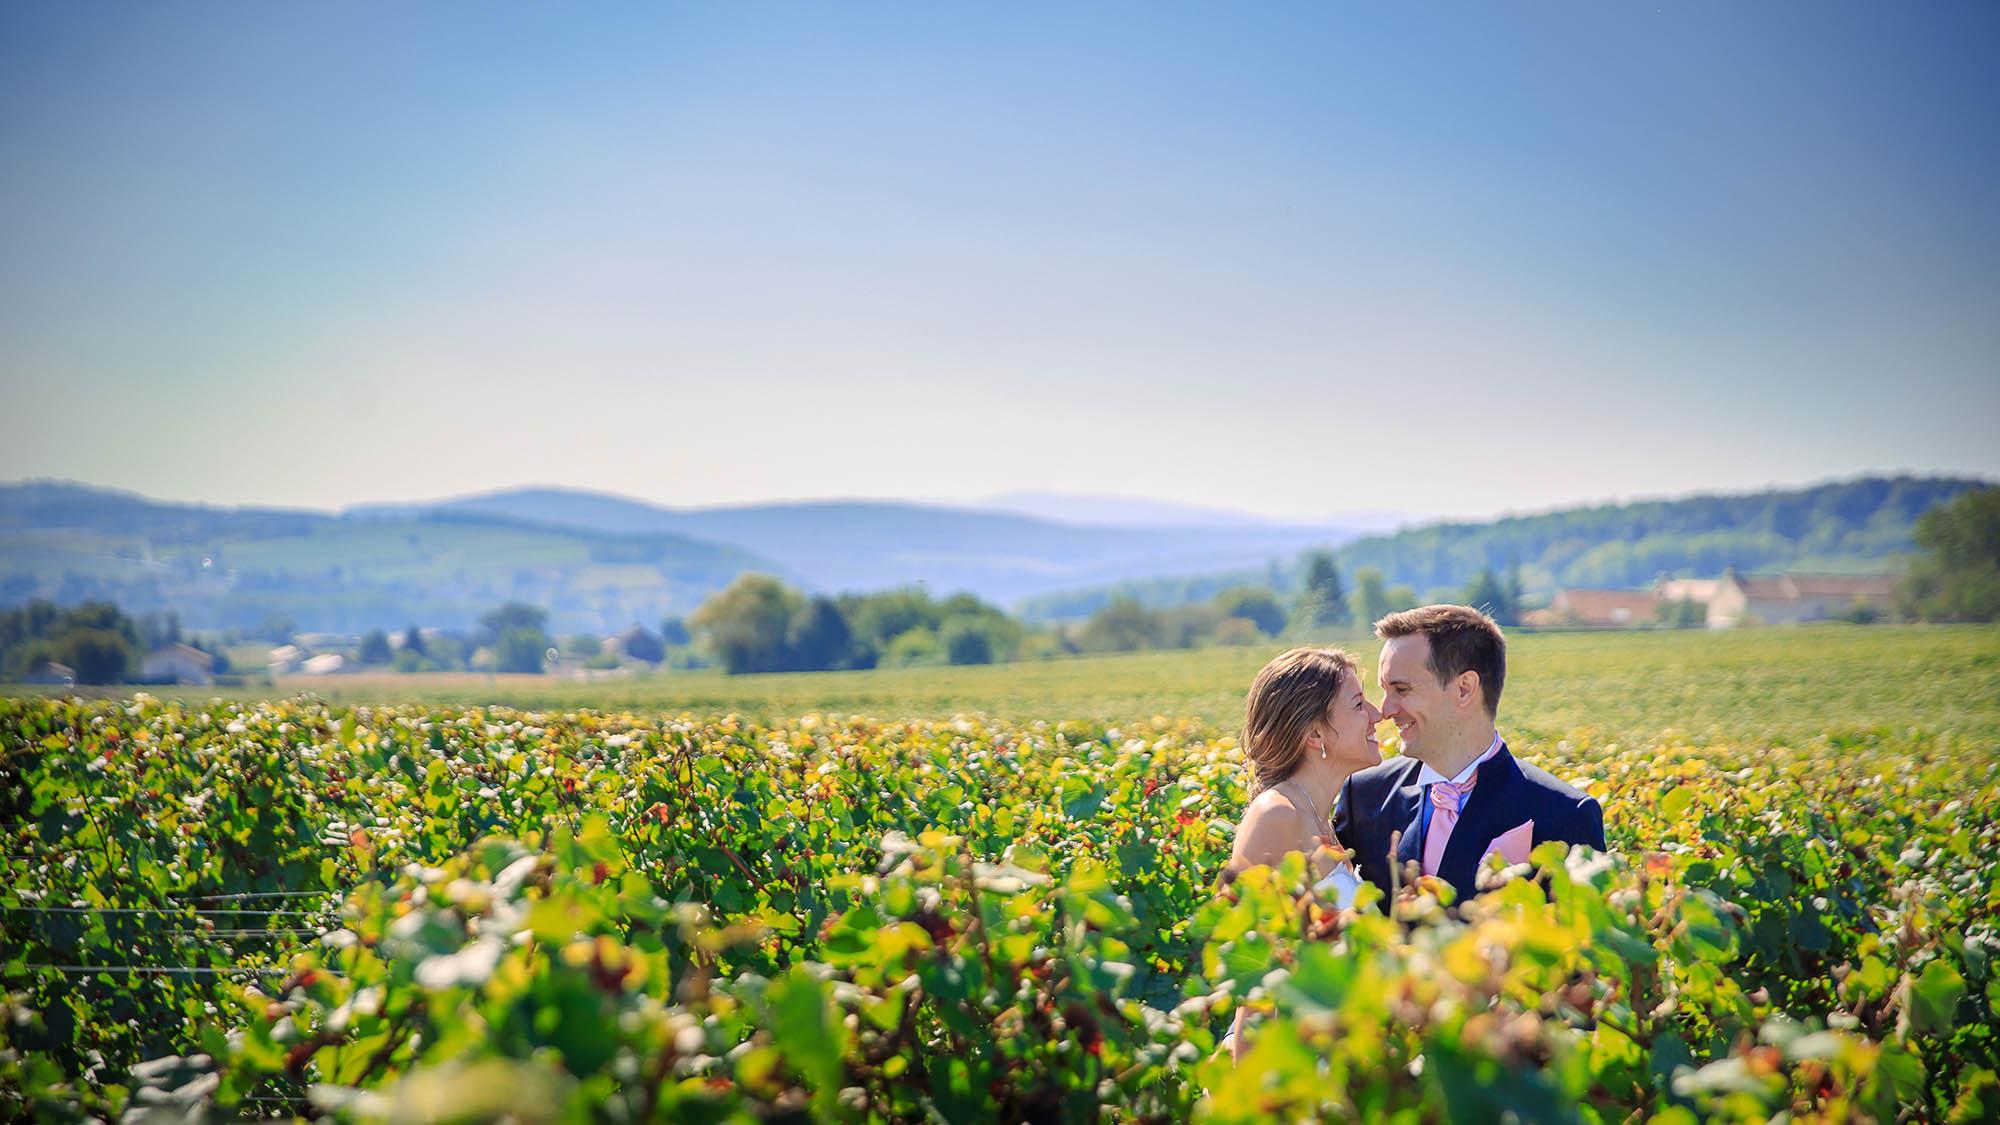 Photographe mariage Beaujolais Villefranche-sur-Saone